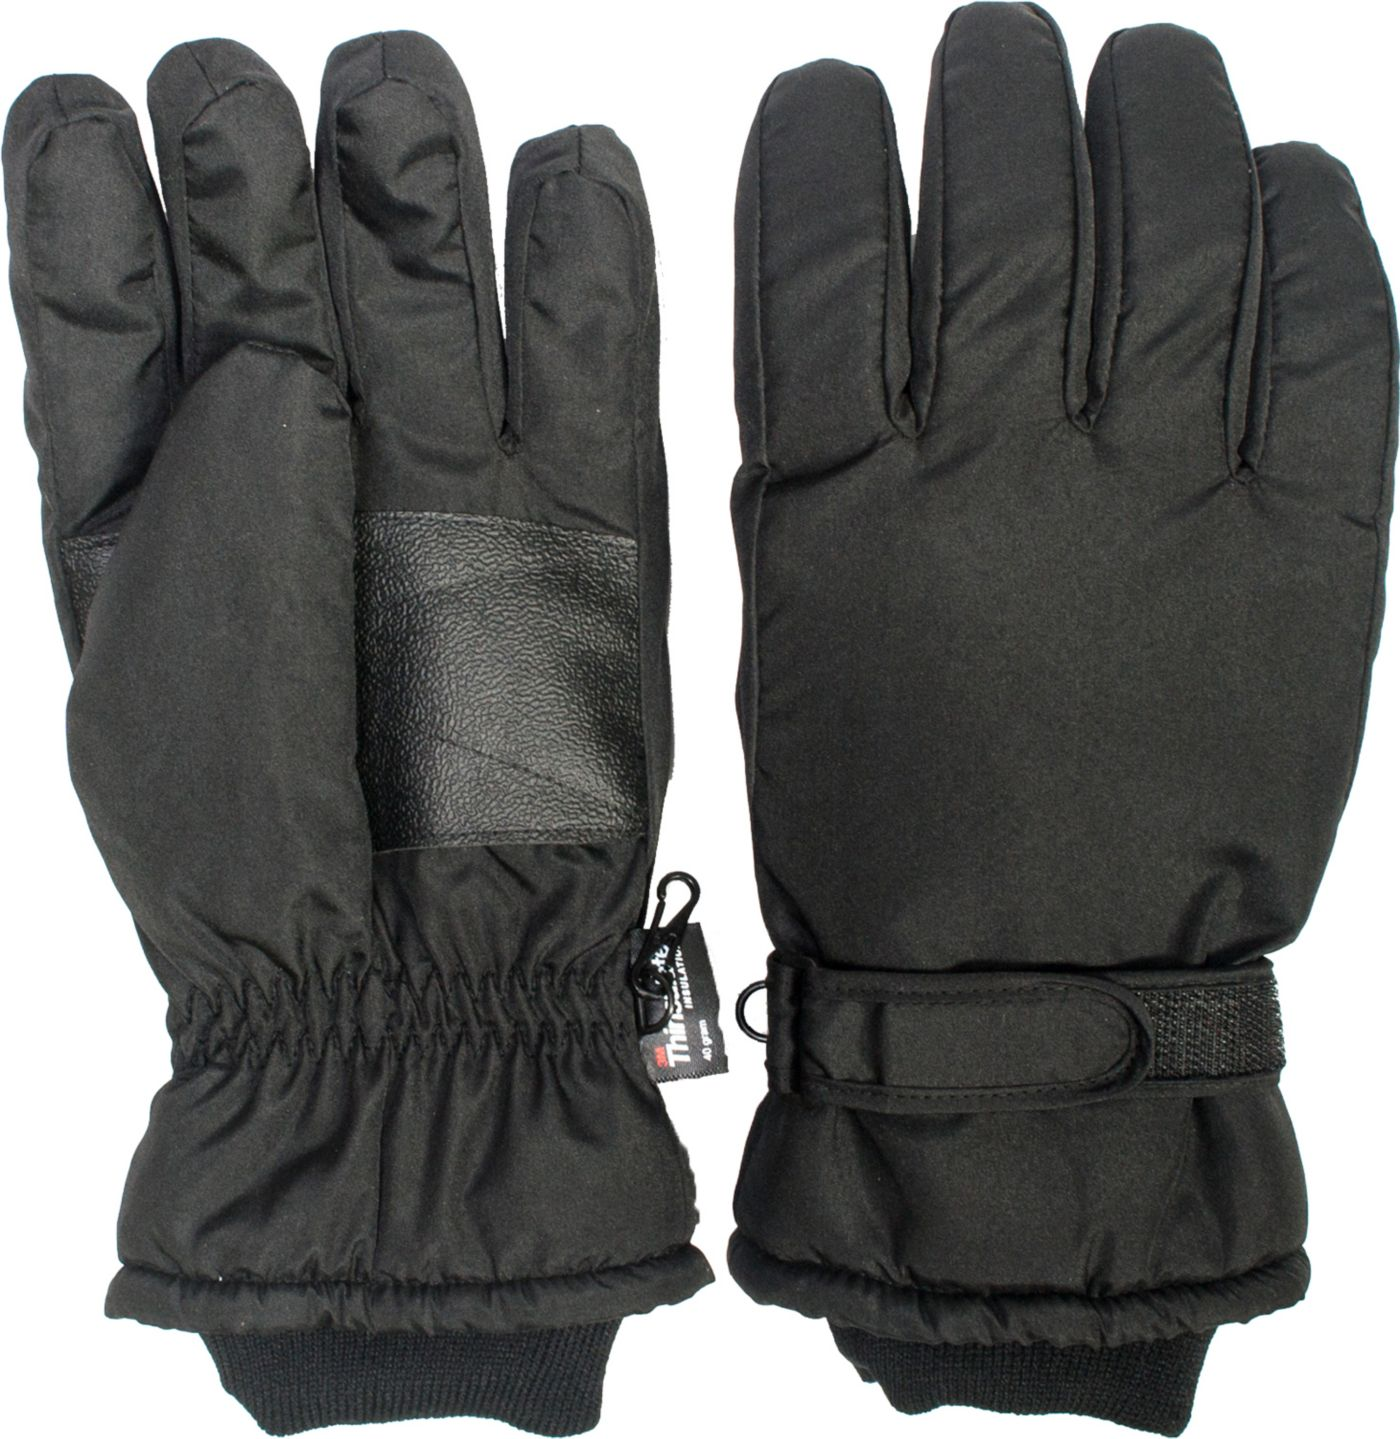 QuietWear Men's Waterproof Thinsulate Gloves